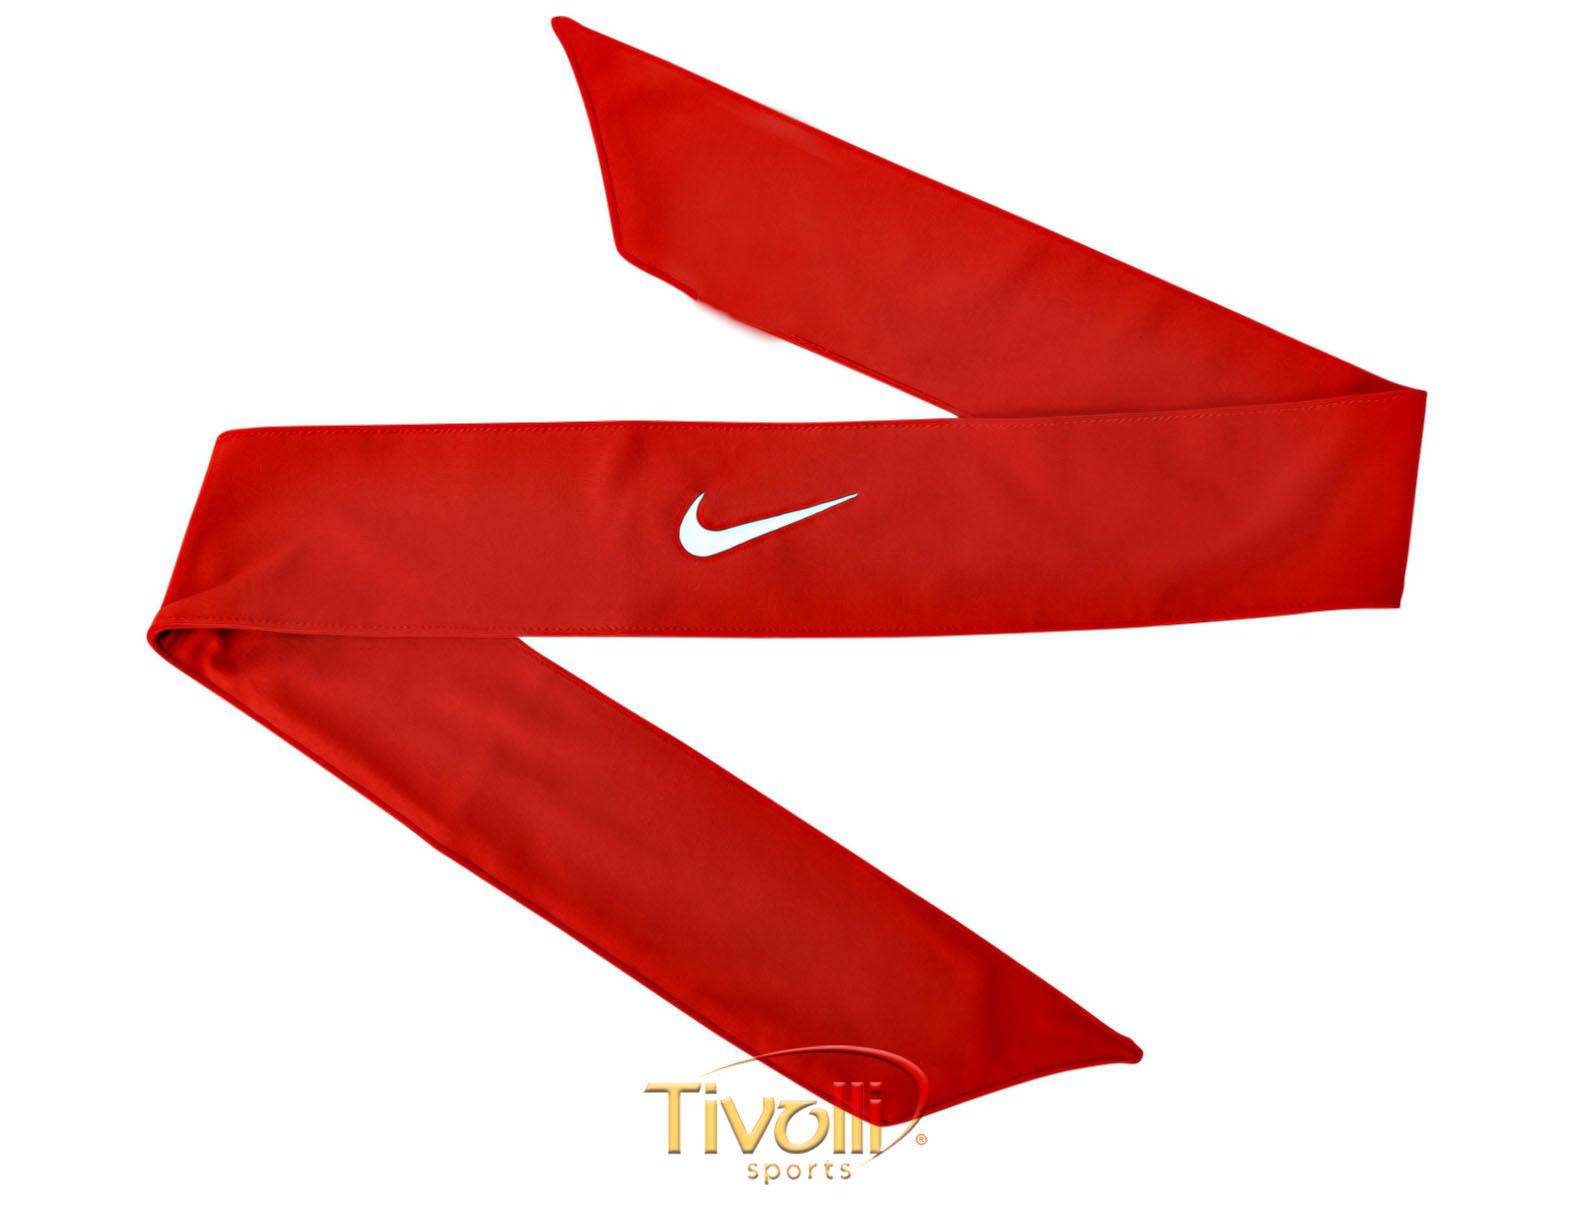 Faixa Bandana Nike   Dri-Fit Head Tie 2.0 Vermelha   b9dcc42738c